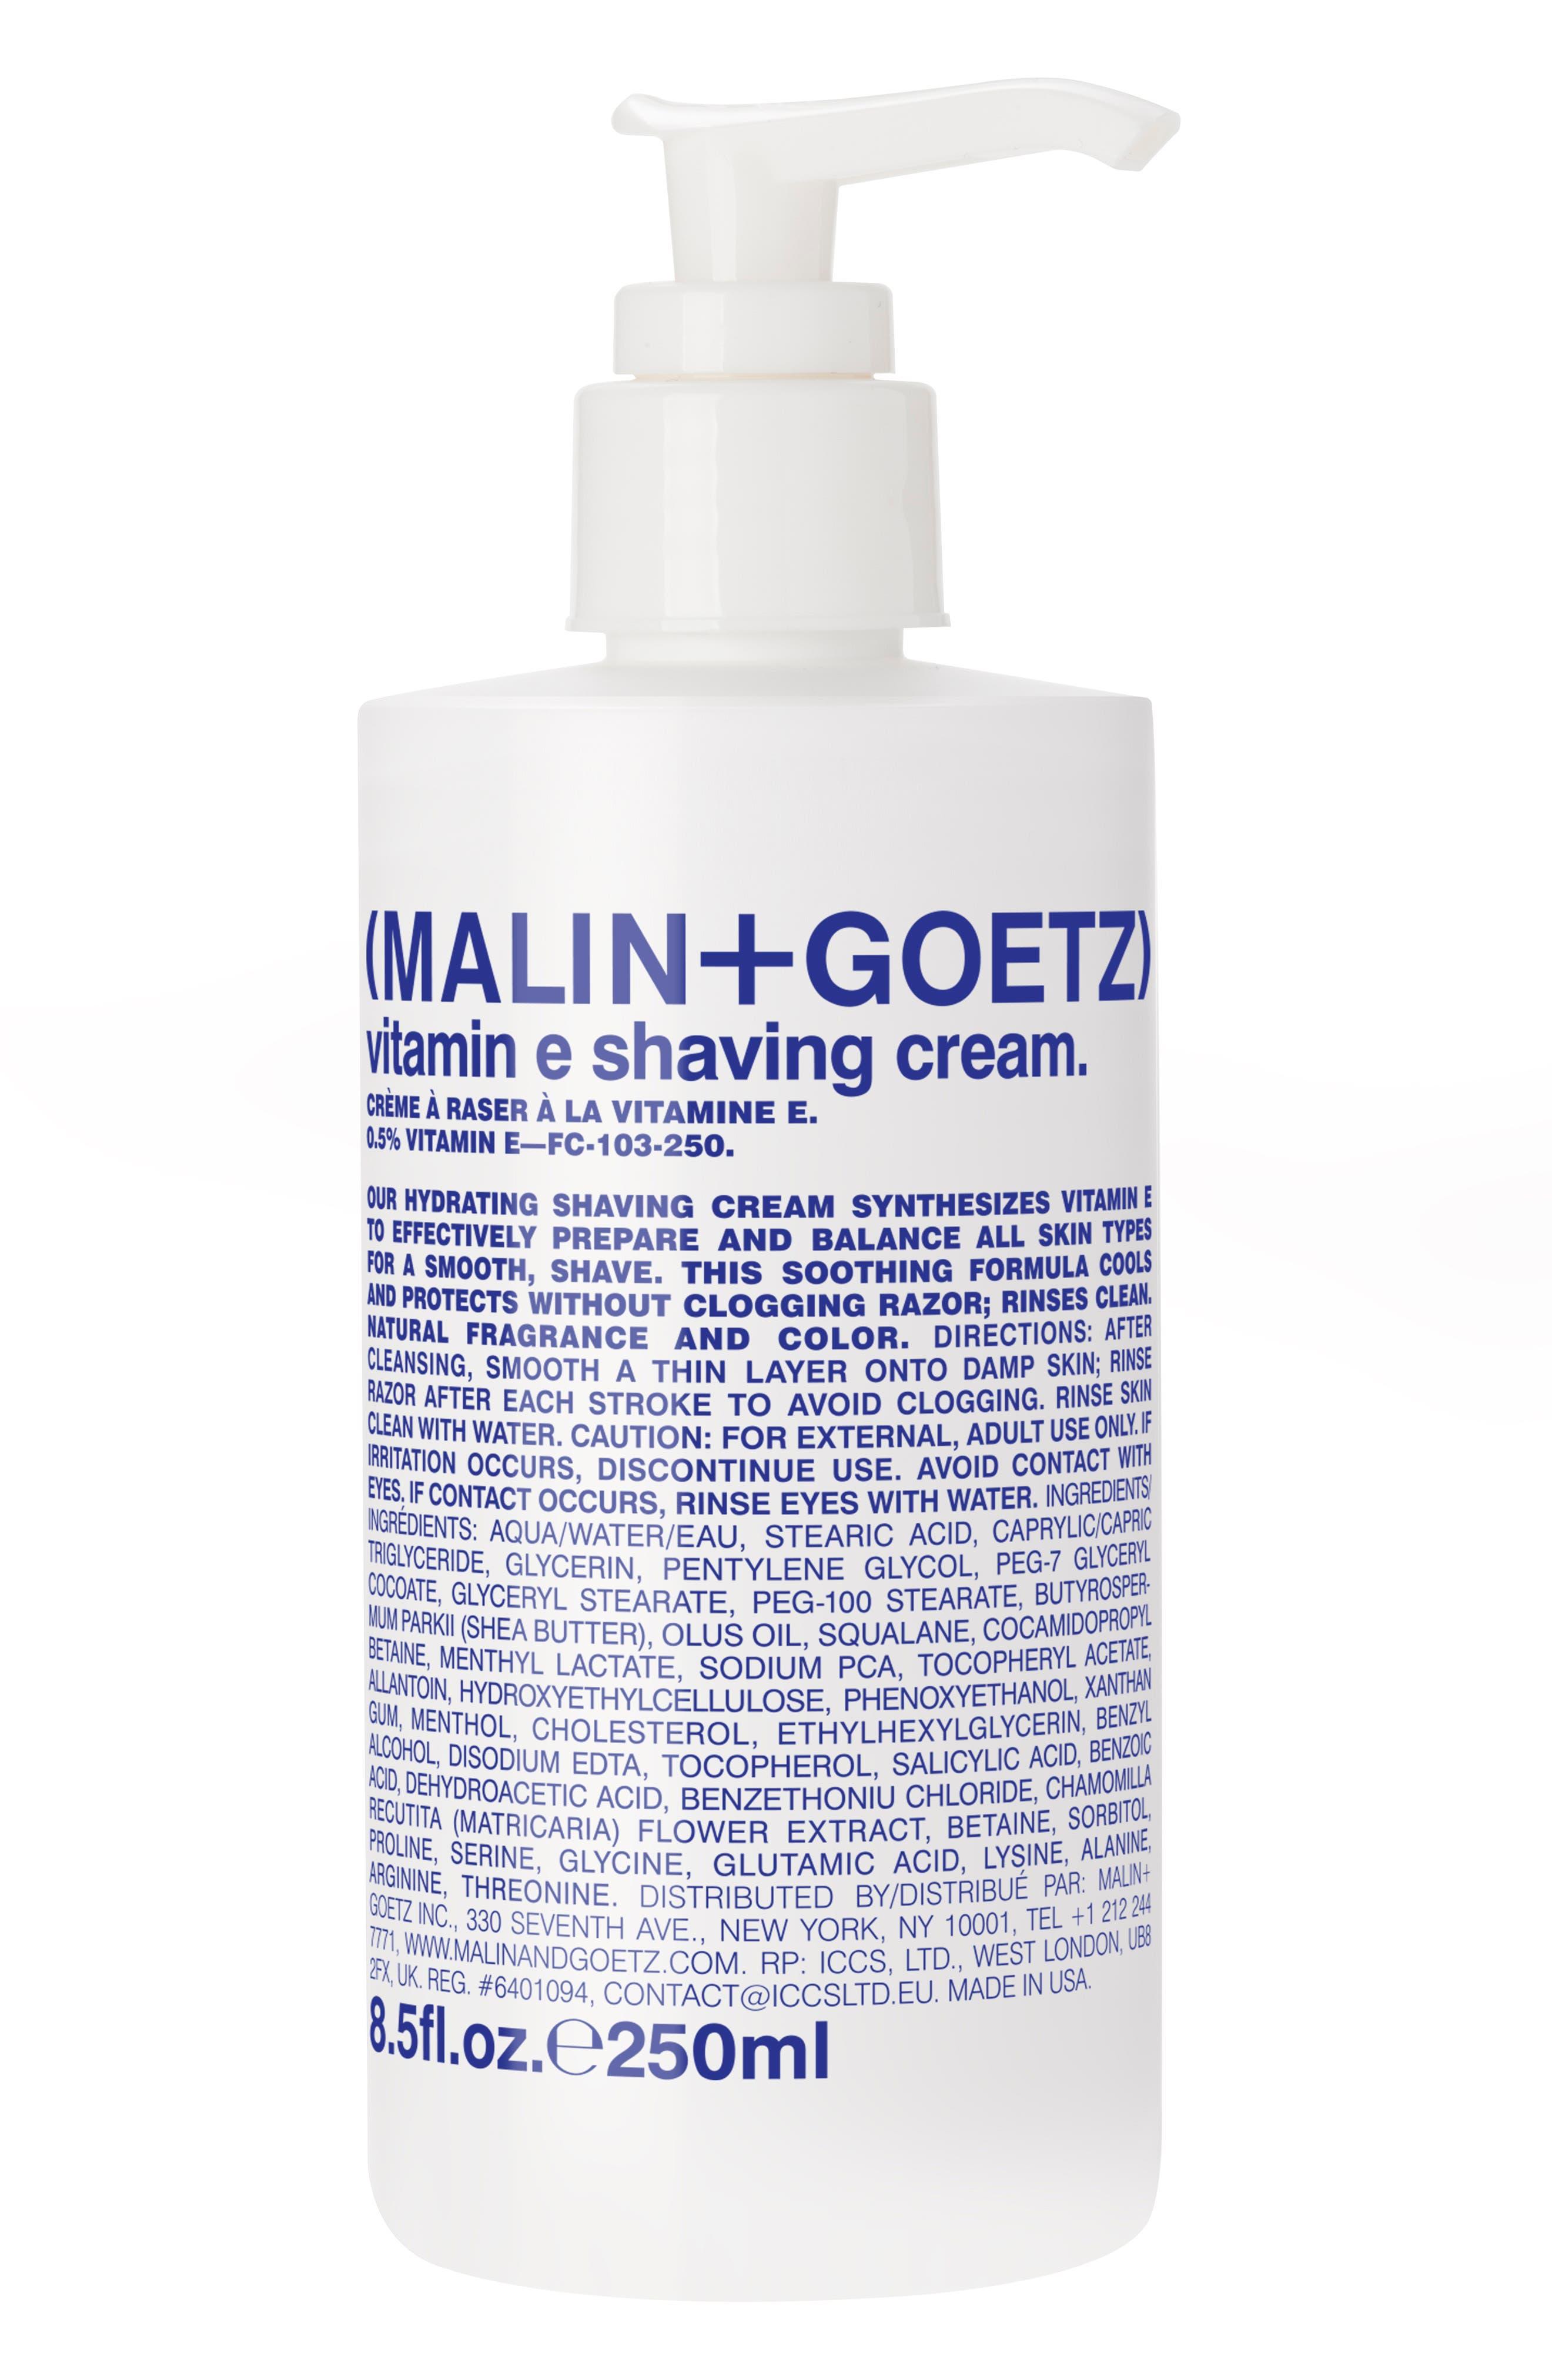 Malin+Goetz Vitamin E Shaving Cream Pump